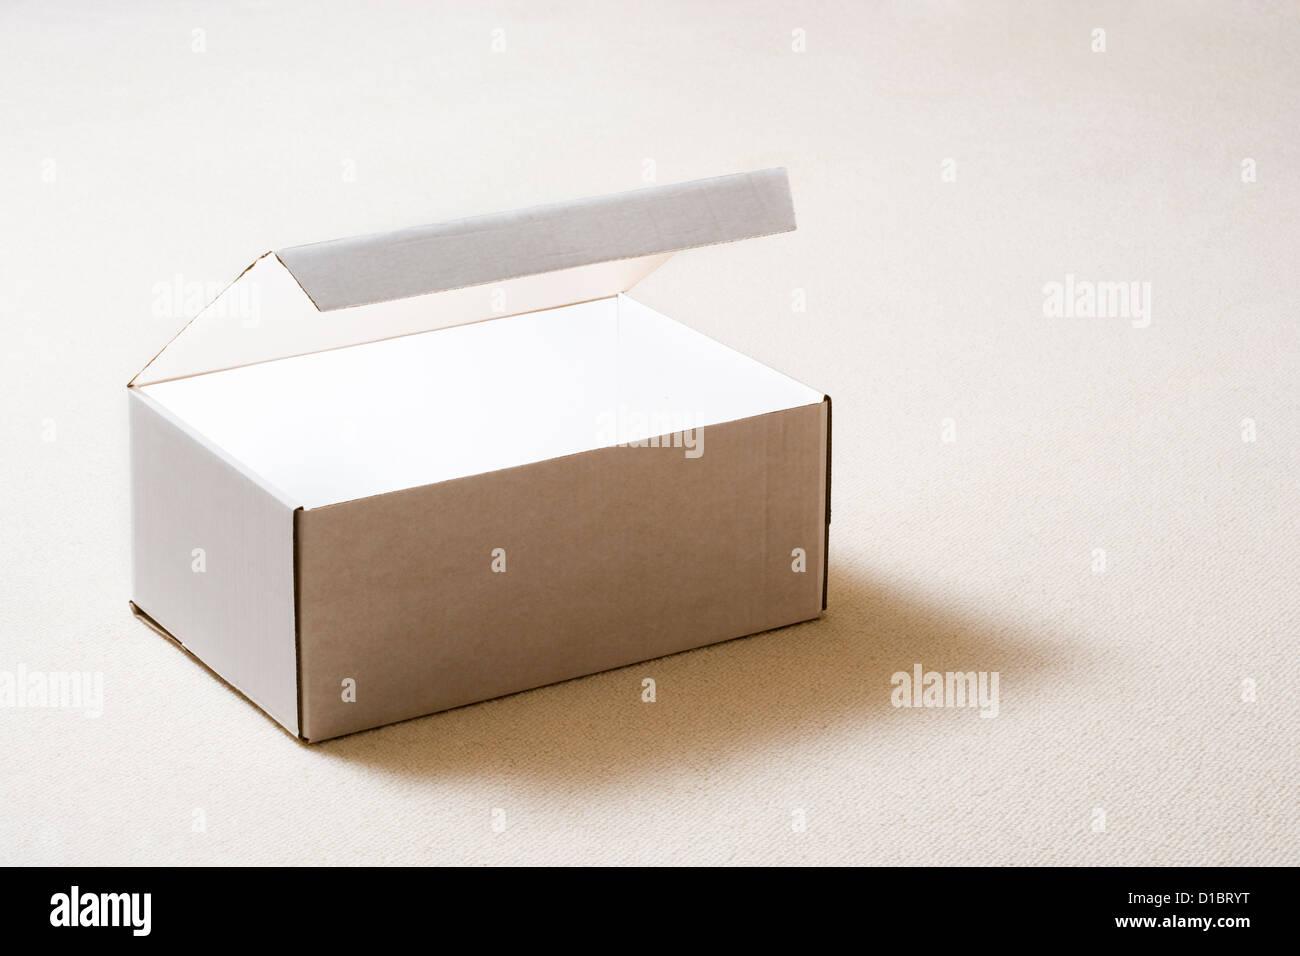 Box lit inside. - Stock Image